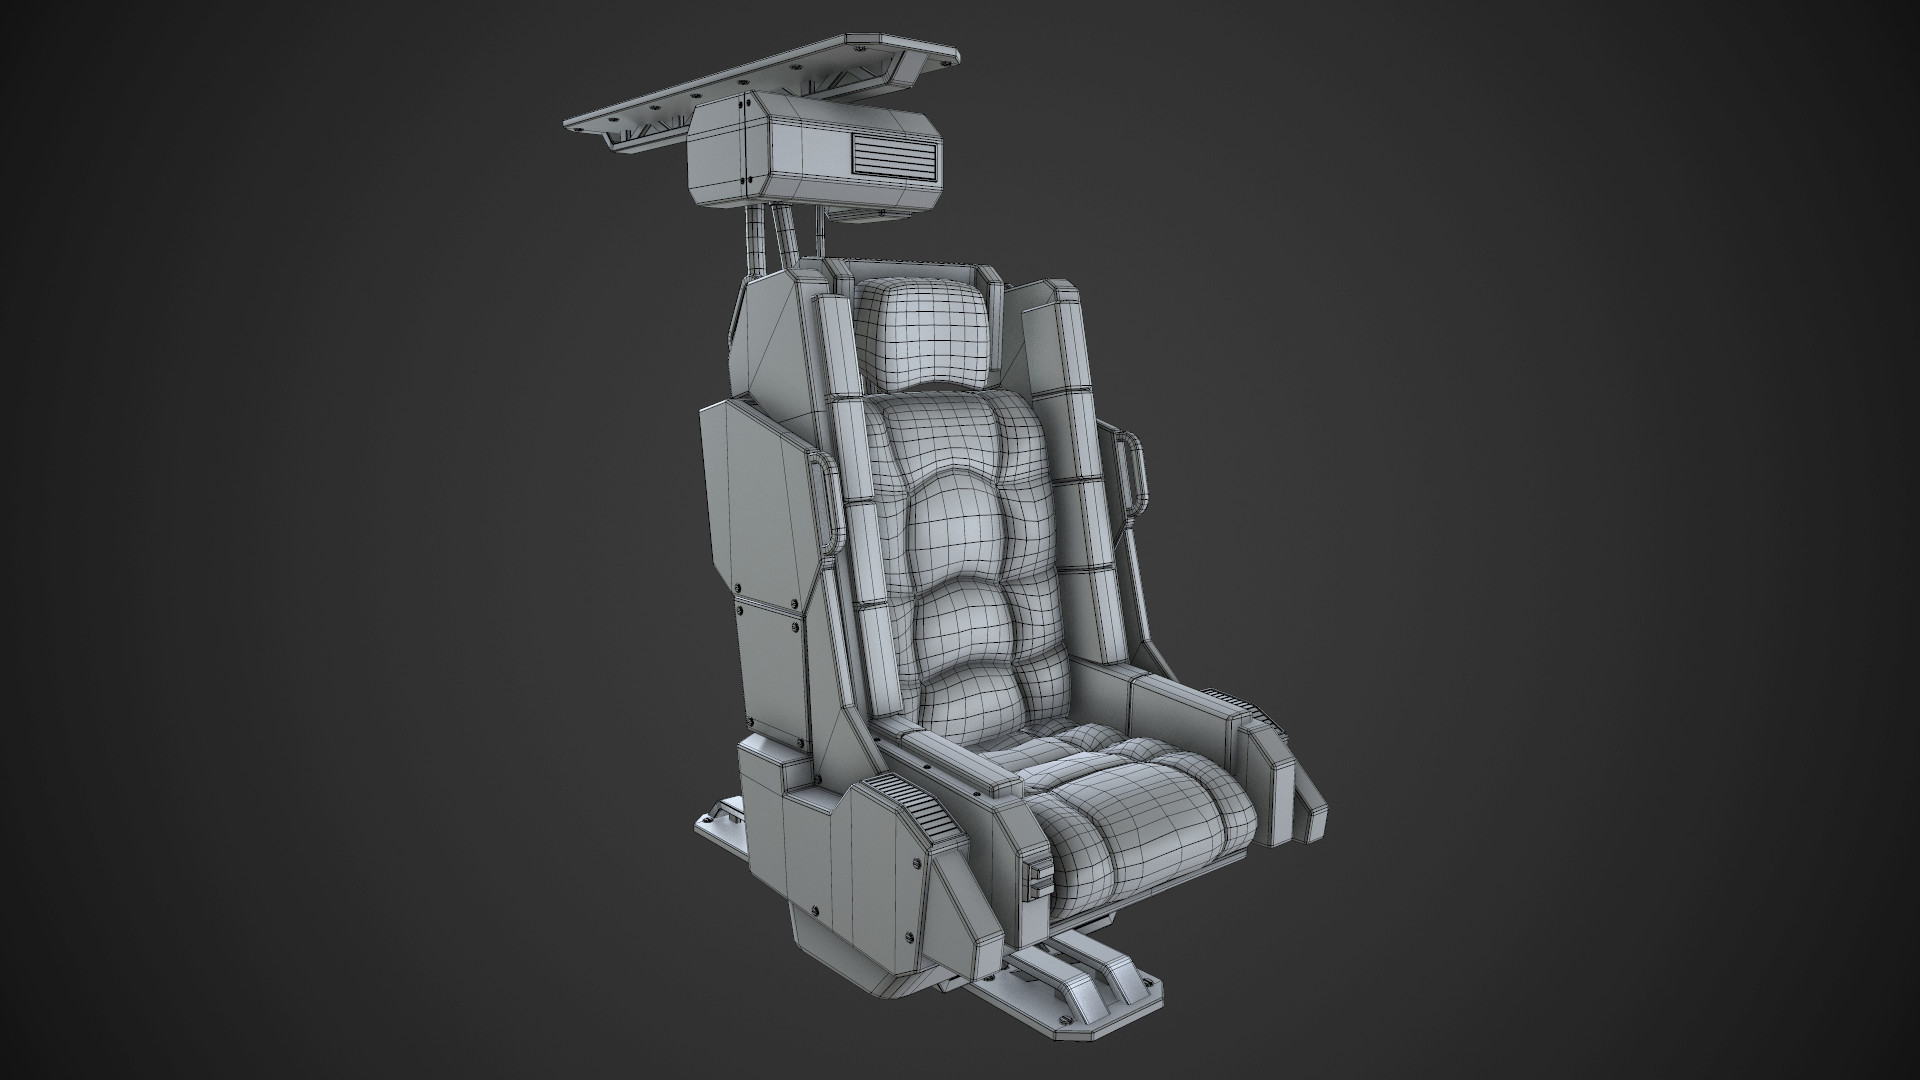 ArtStation - Spaceship Chair, Nikola Dimitrijevic